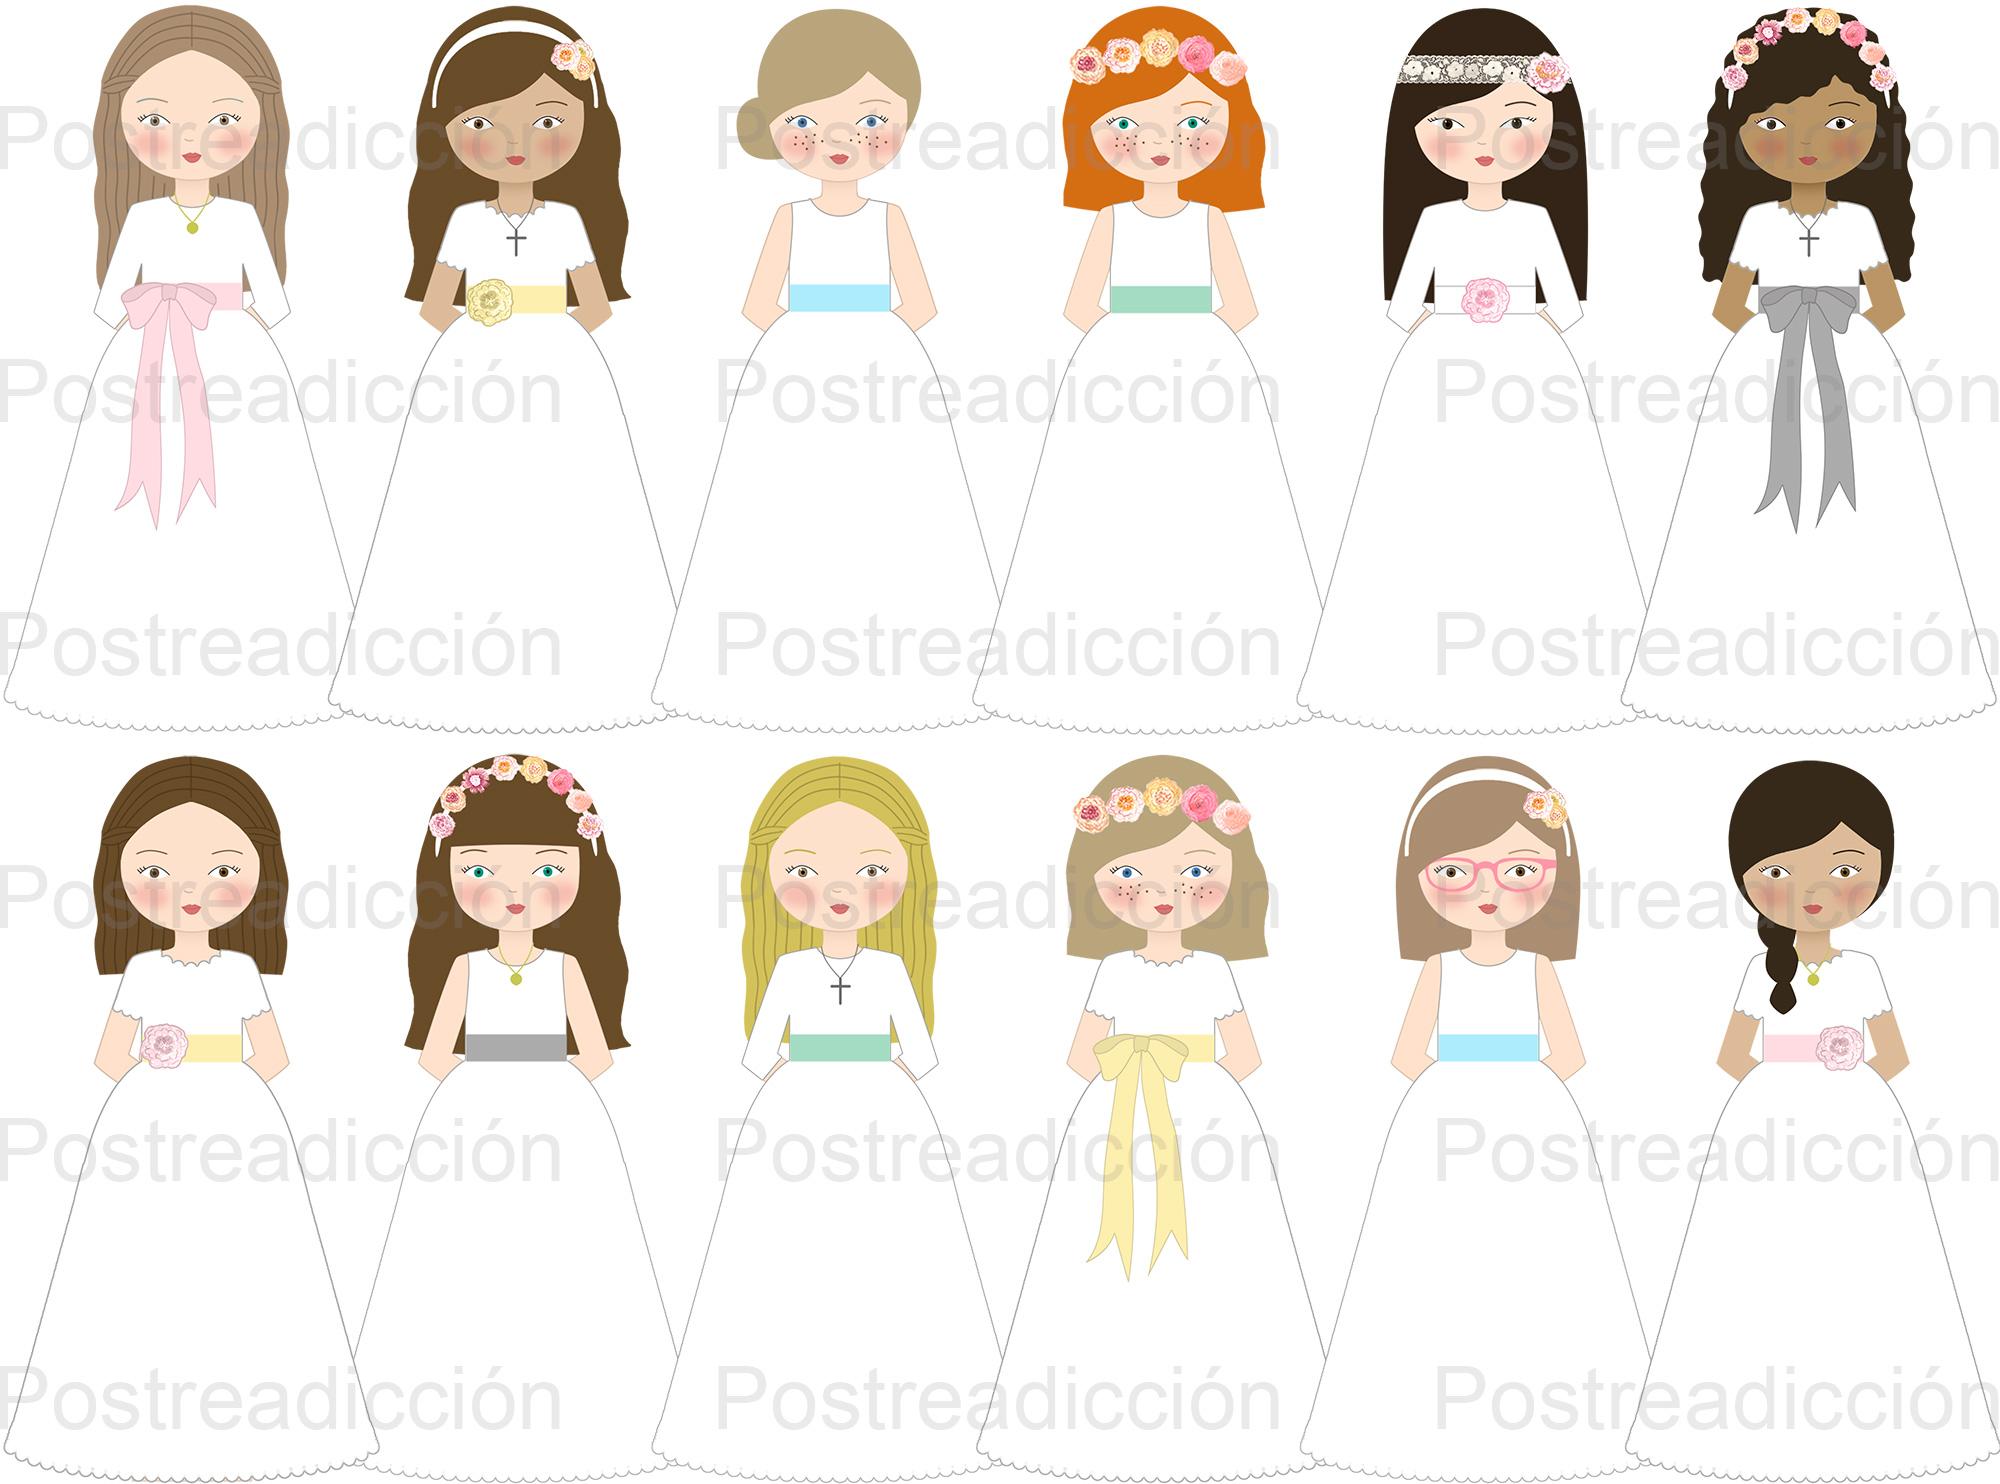 Imagen de producto: https://tienda.postreadiccion.com/img/articulos/secundarias6759-15-toppers-de-comunion-carlota-modelo-no-791-1.jpg